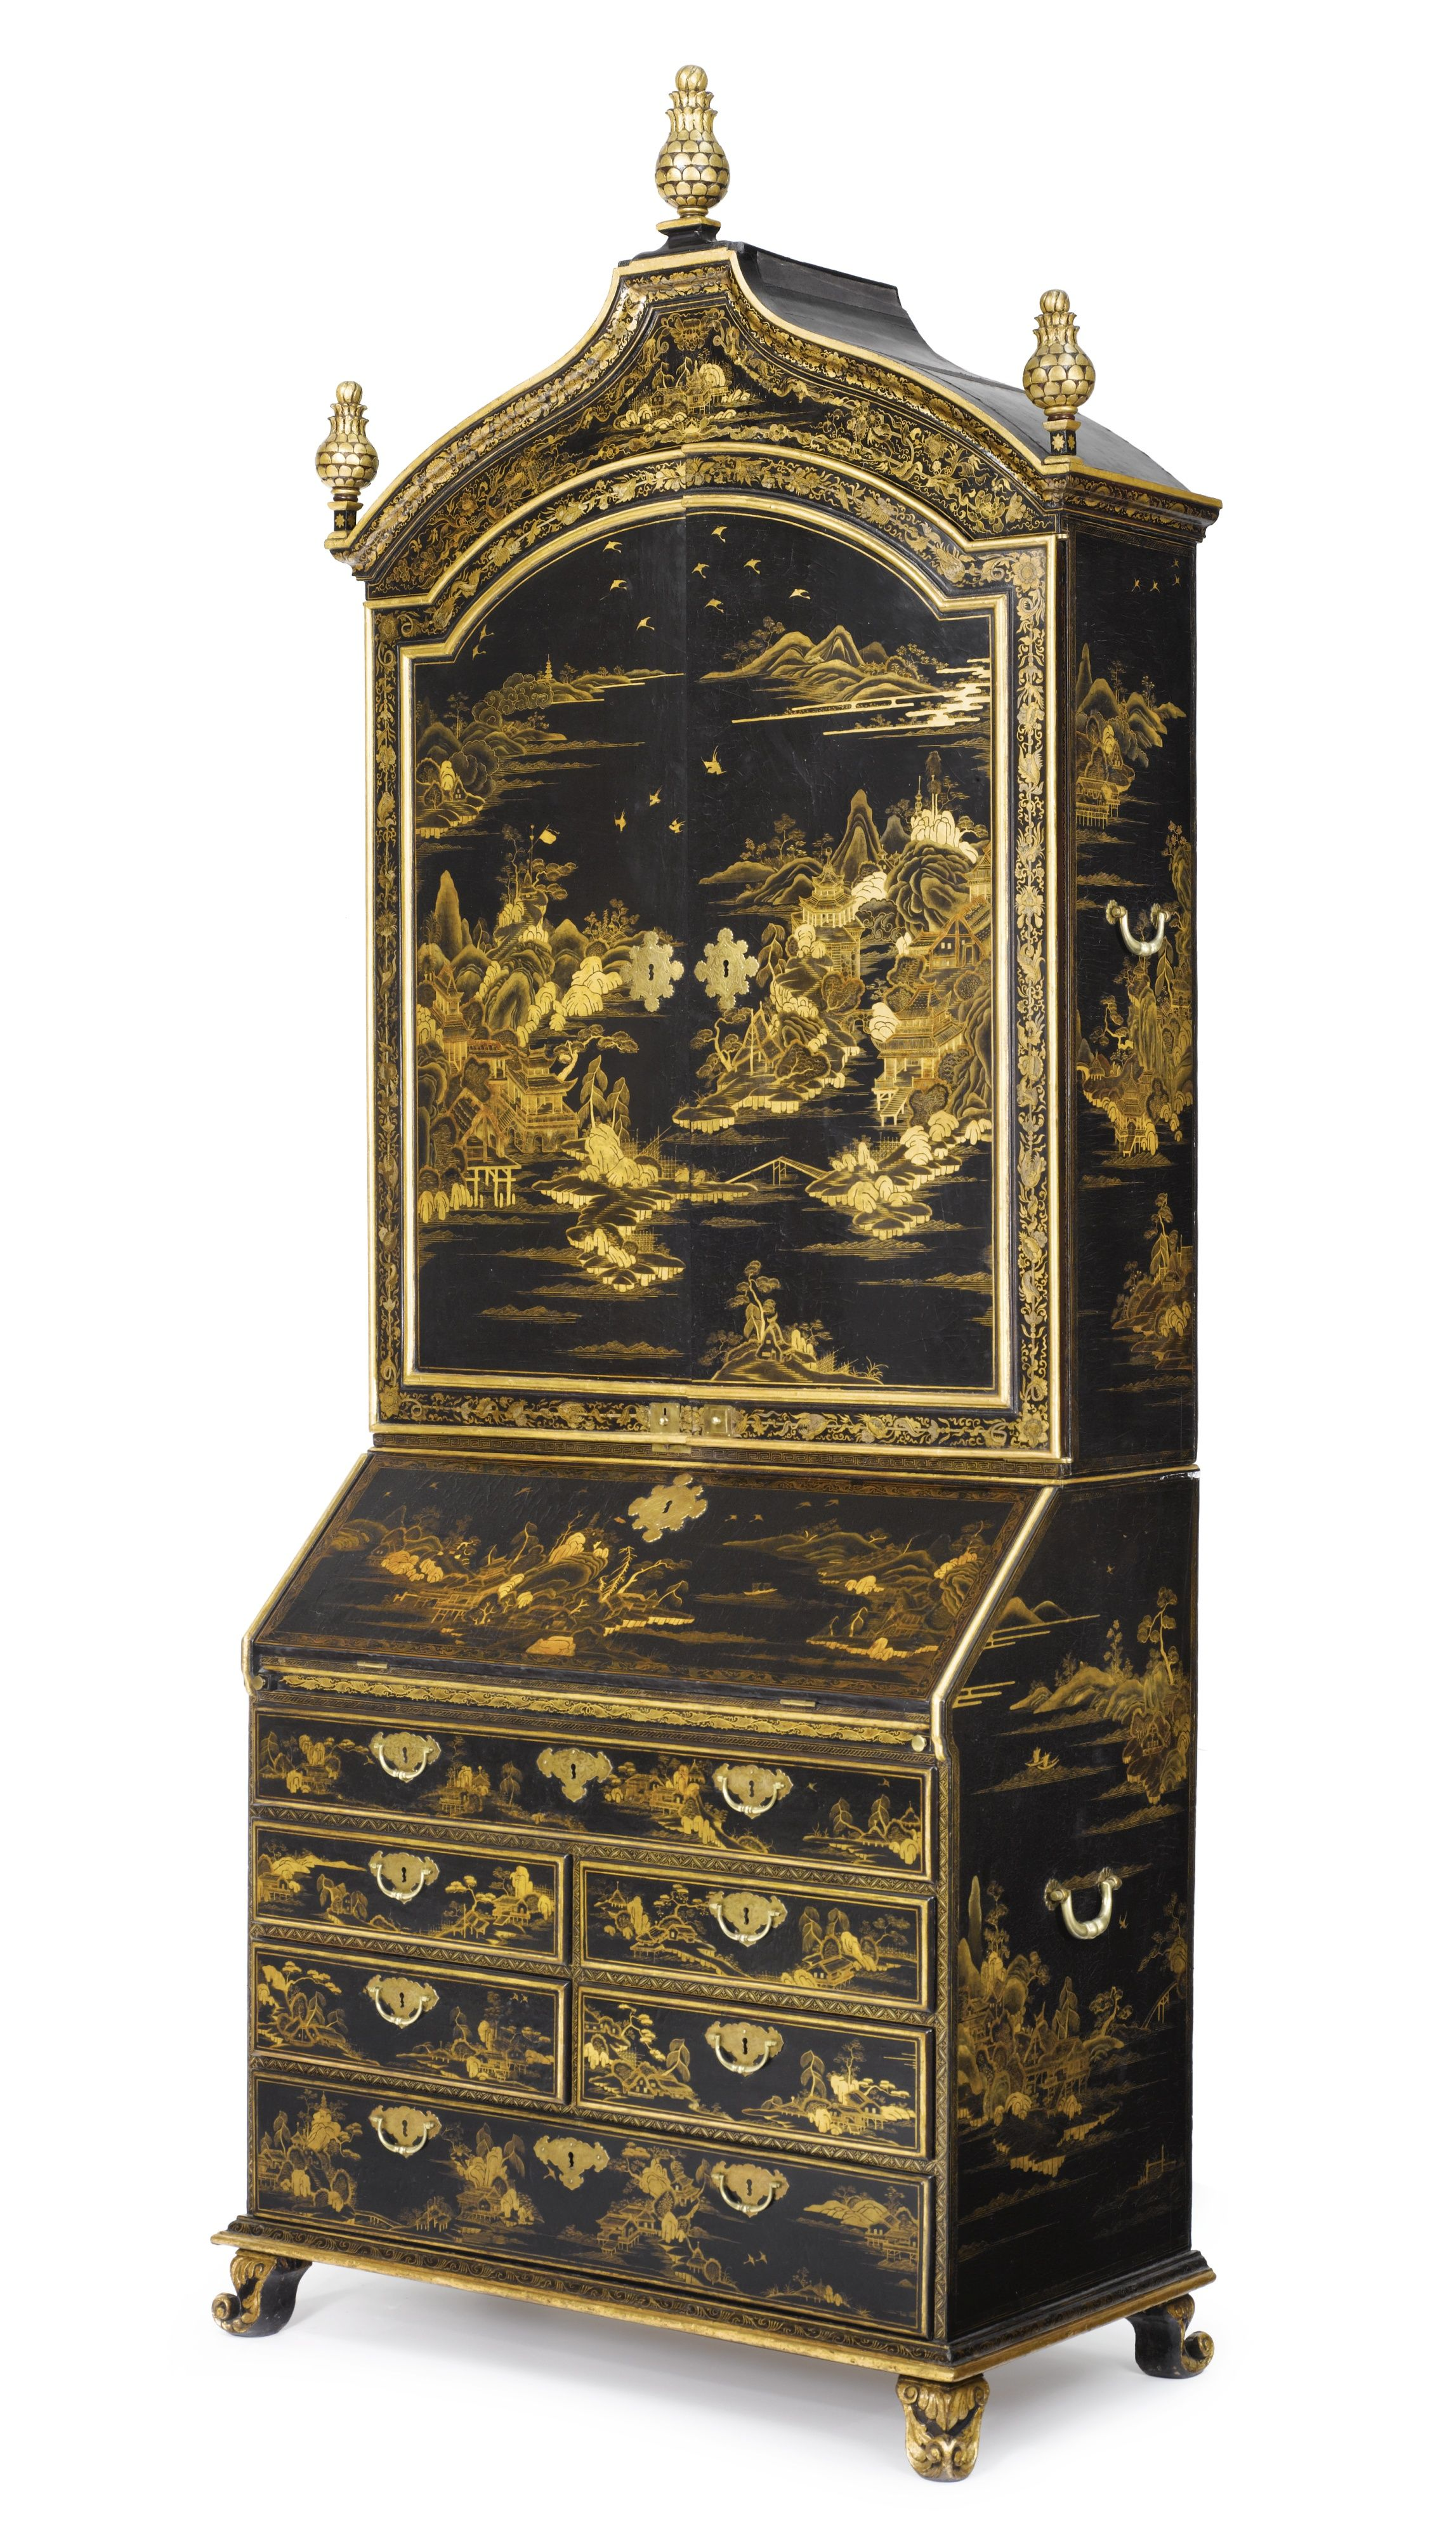 A fine chinese export parcel gilt black lacquer bureau bookcase cabinet circa 1735 muebles - Biombos chinos antiguos ...